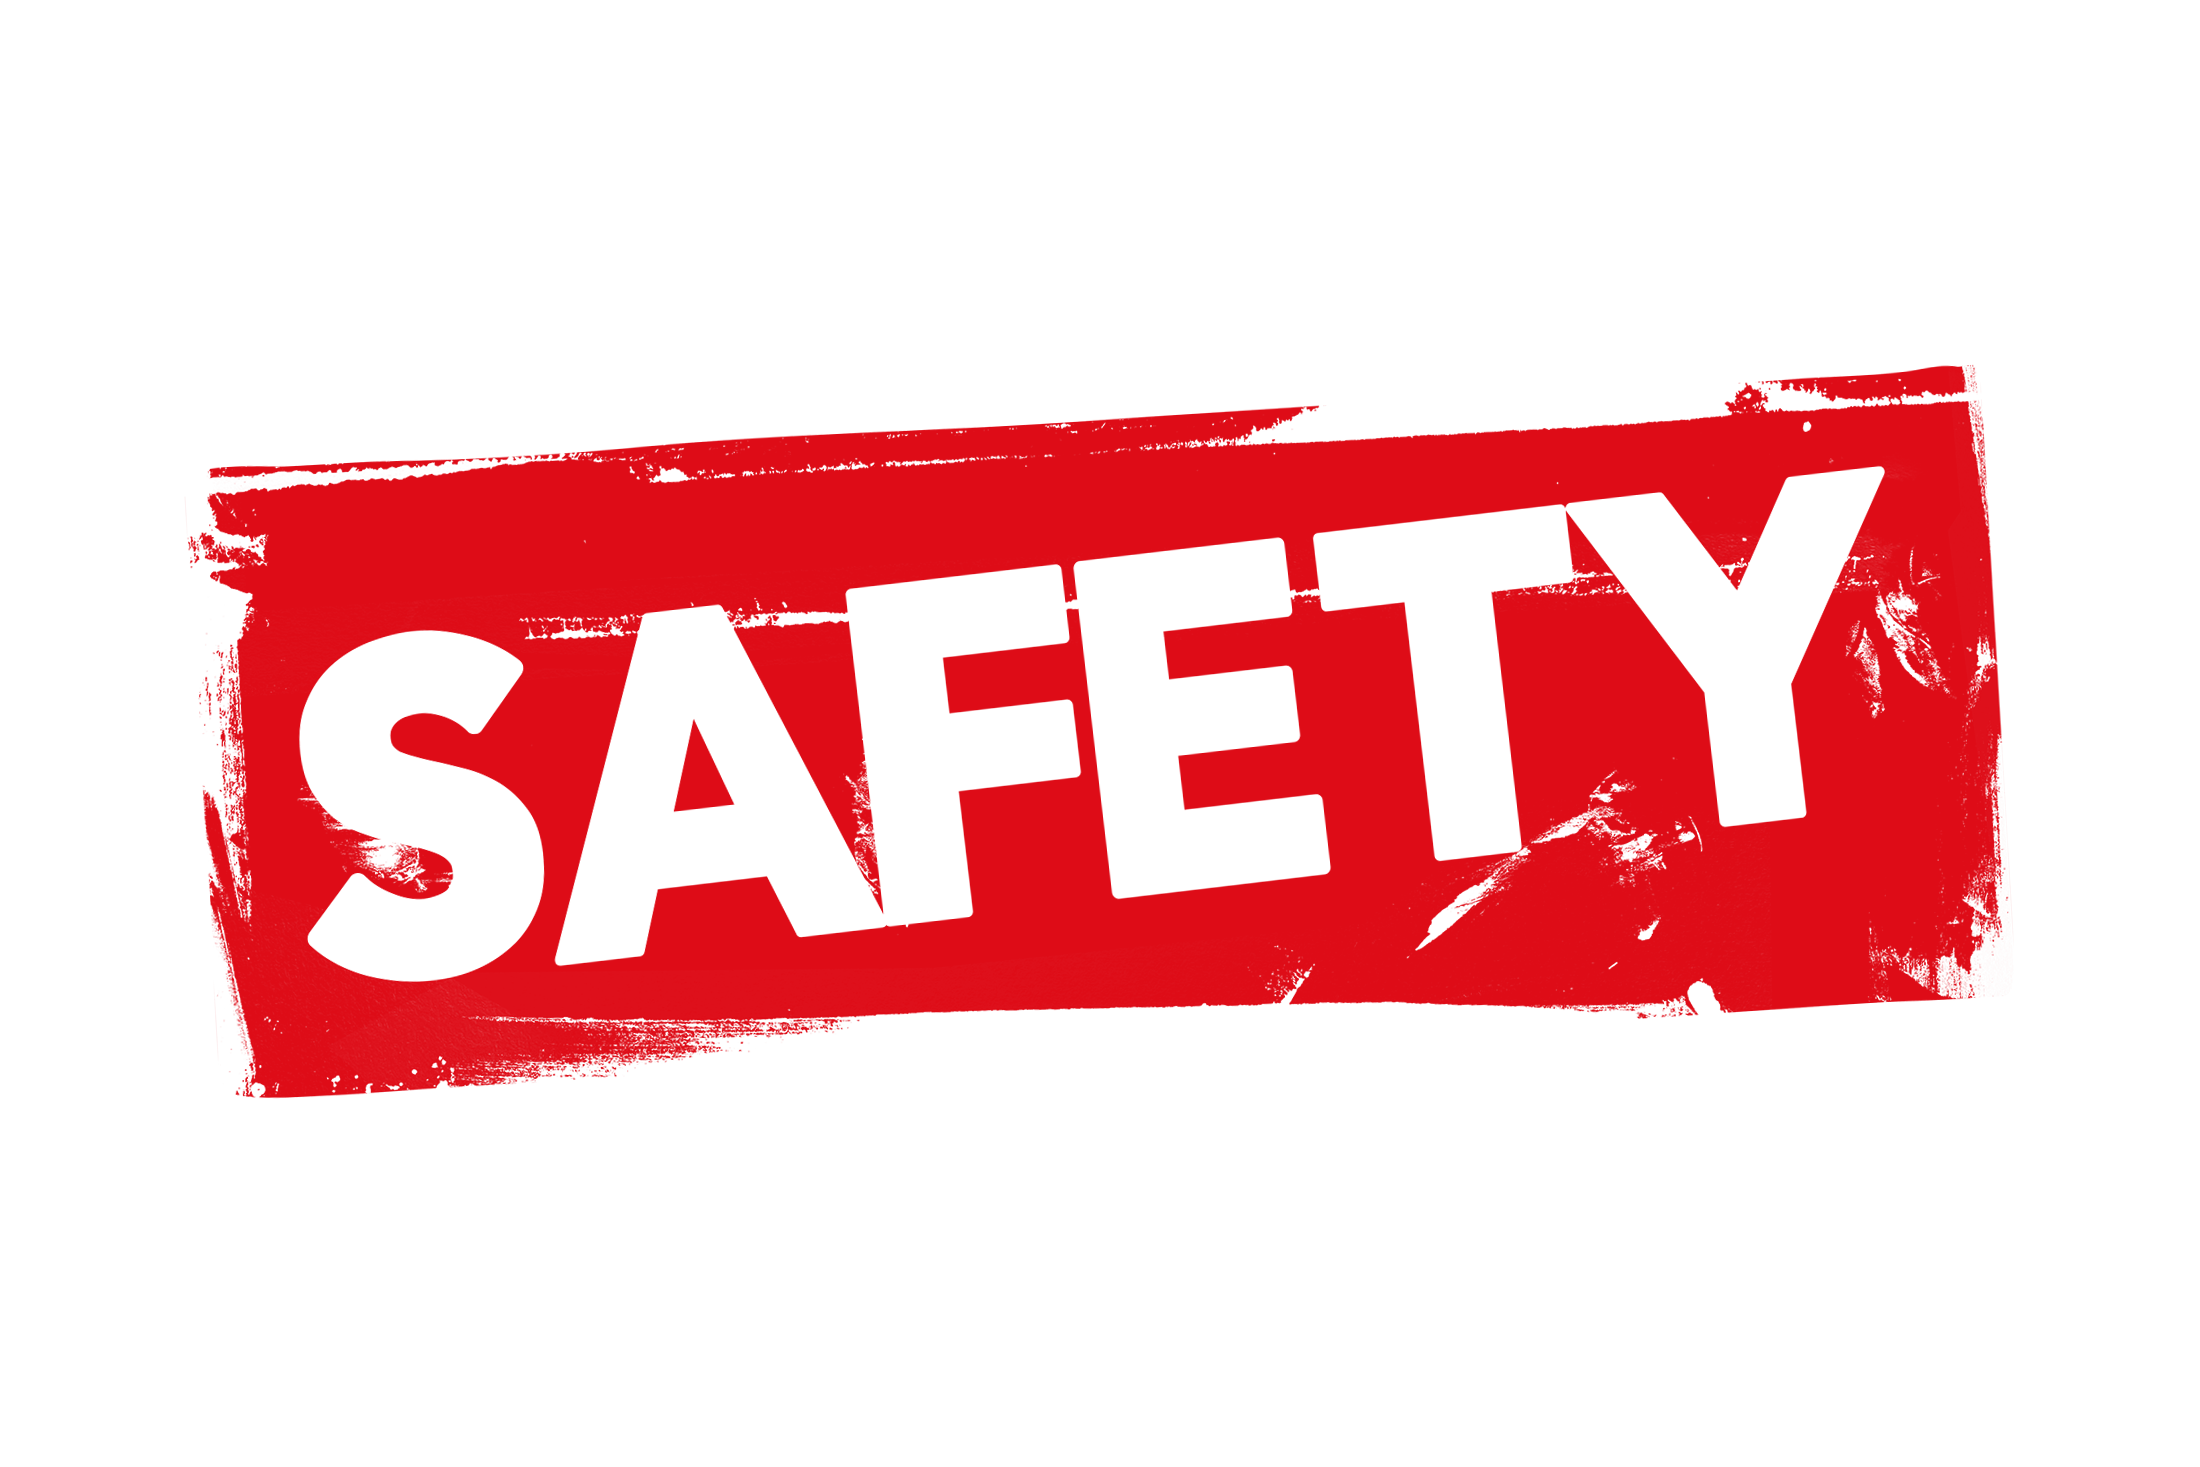 Grunge safety label PSD